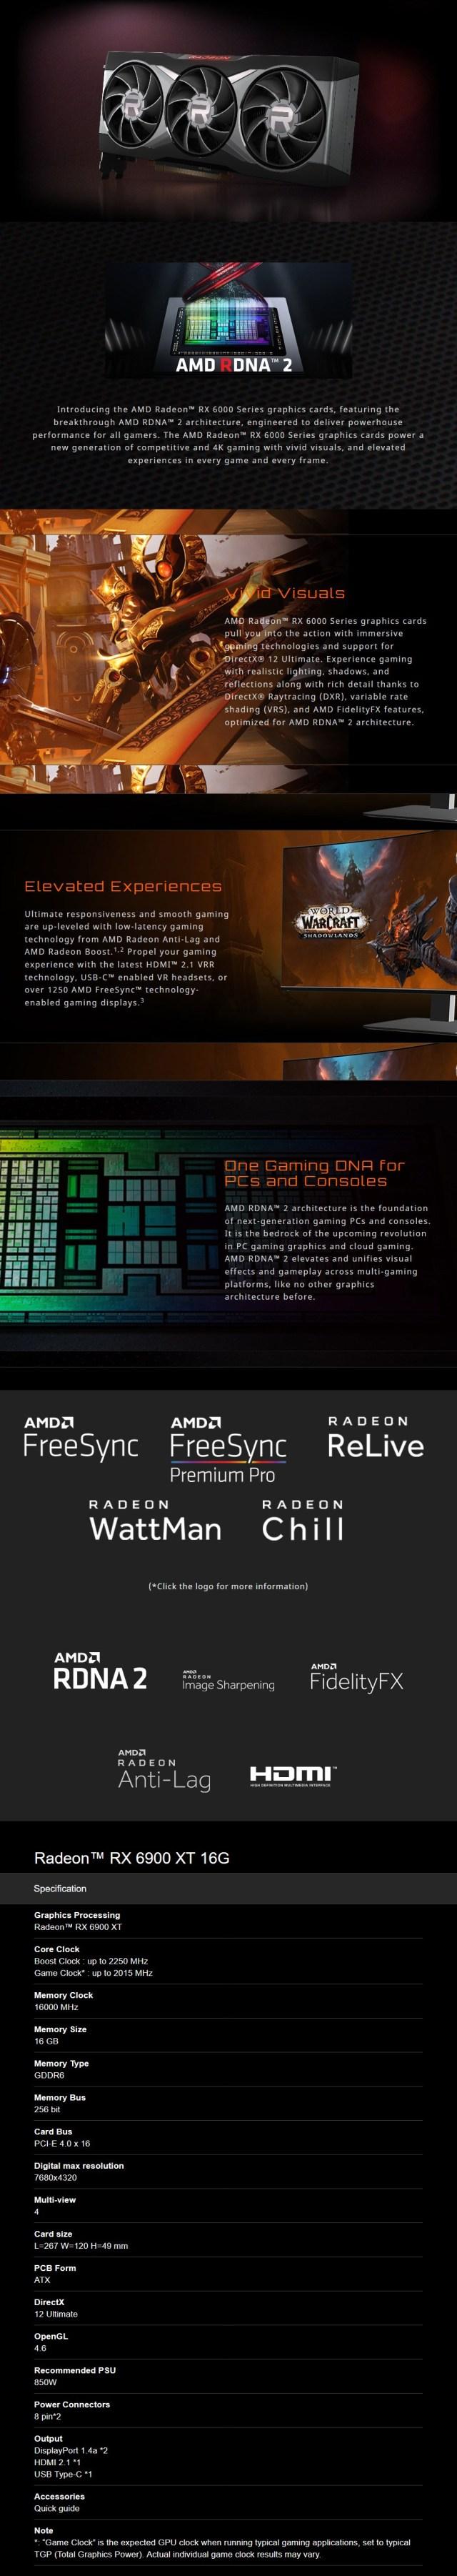 MSI Radeon 6900 XT 16GB Video Card - Overview 1